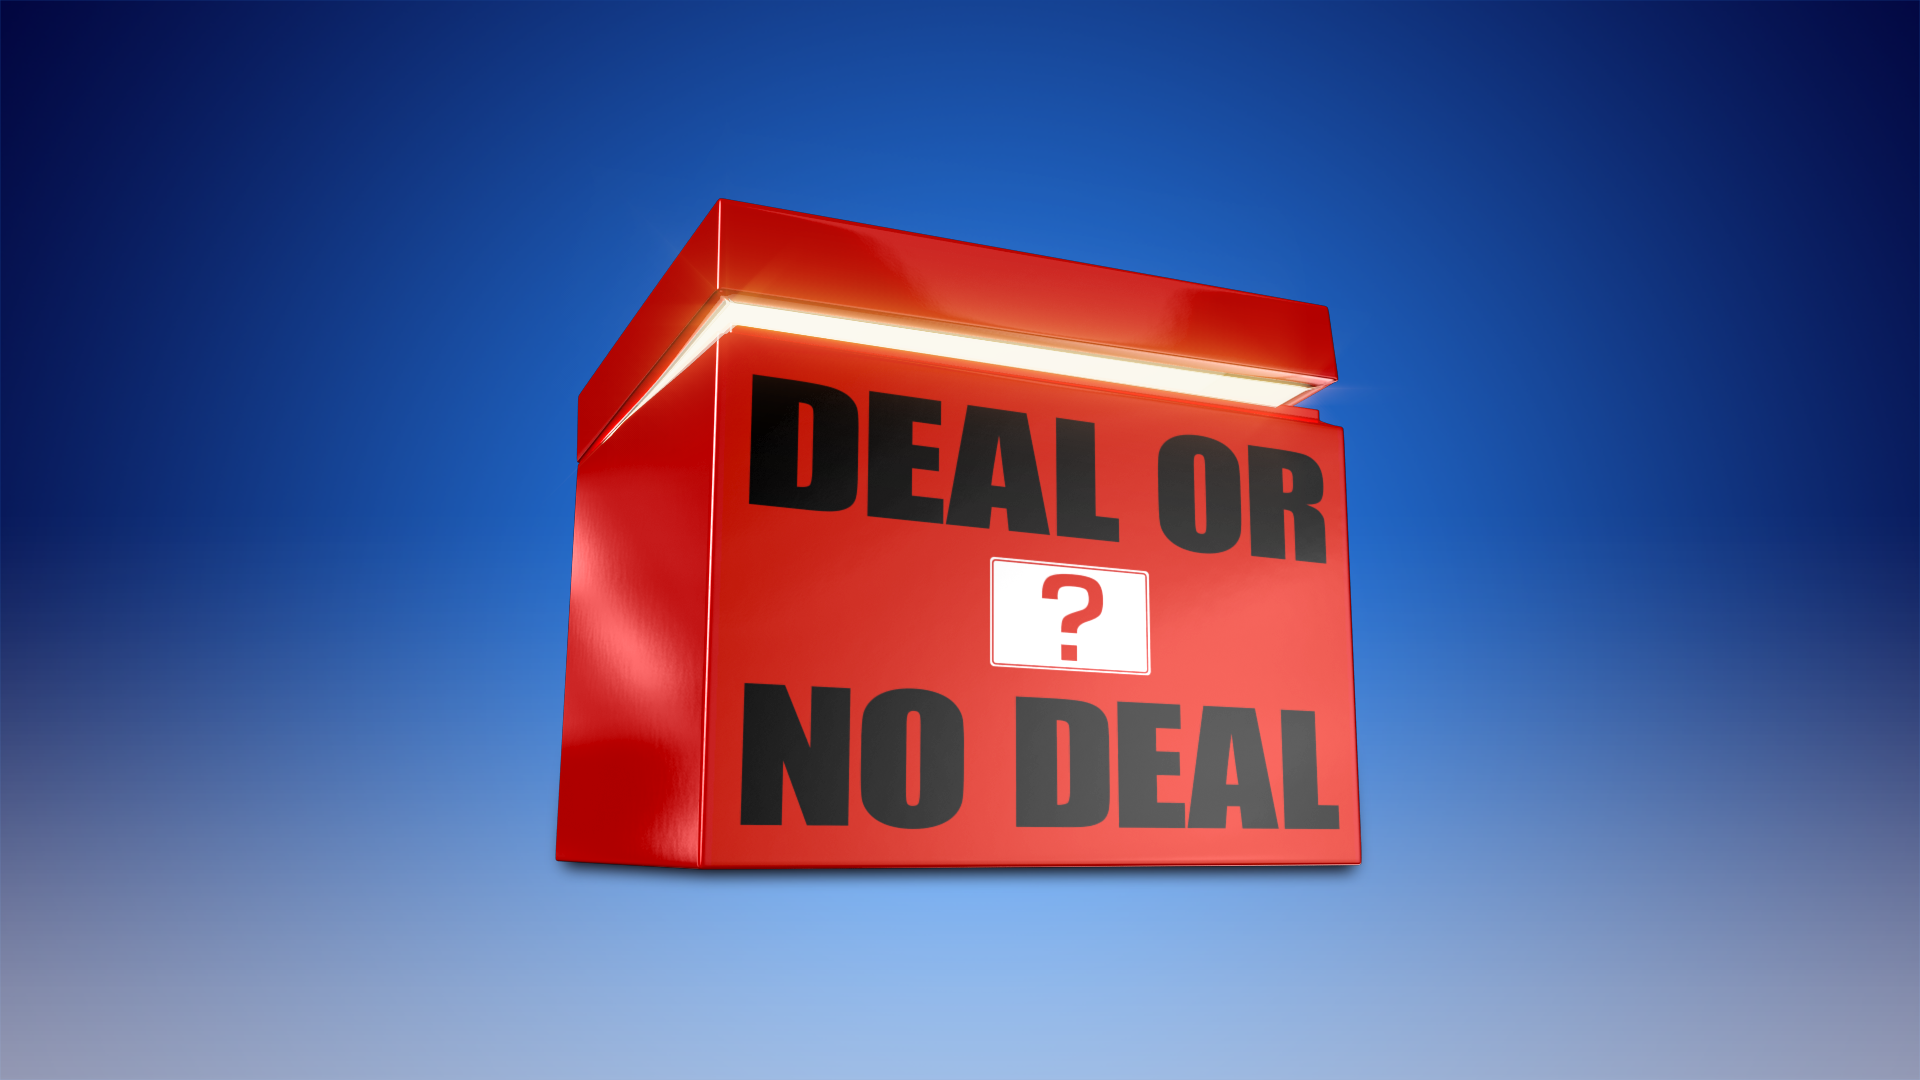 DealorNoDeal